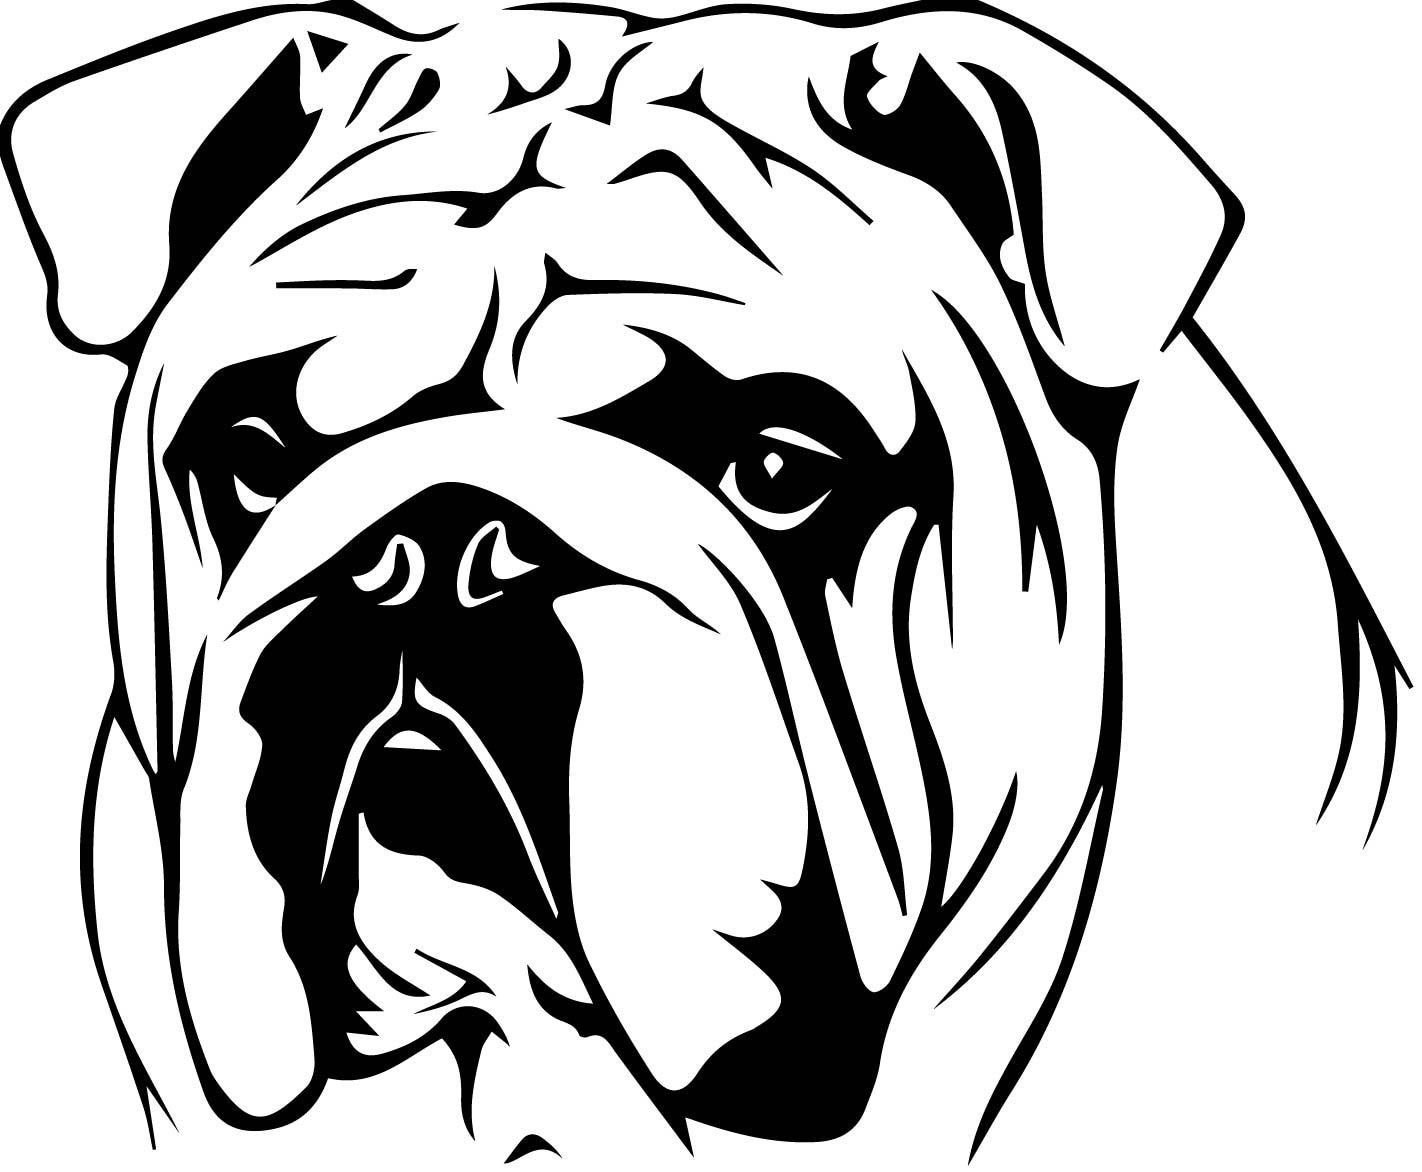 English Bulldog Decal By Dragonflyvinyls On Etsy